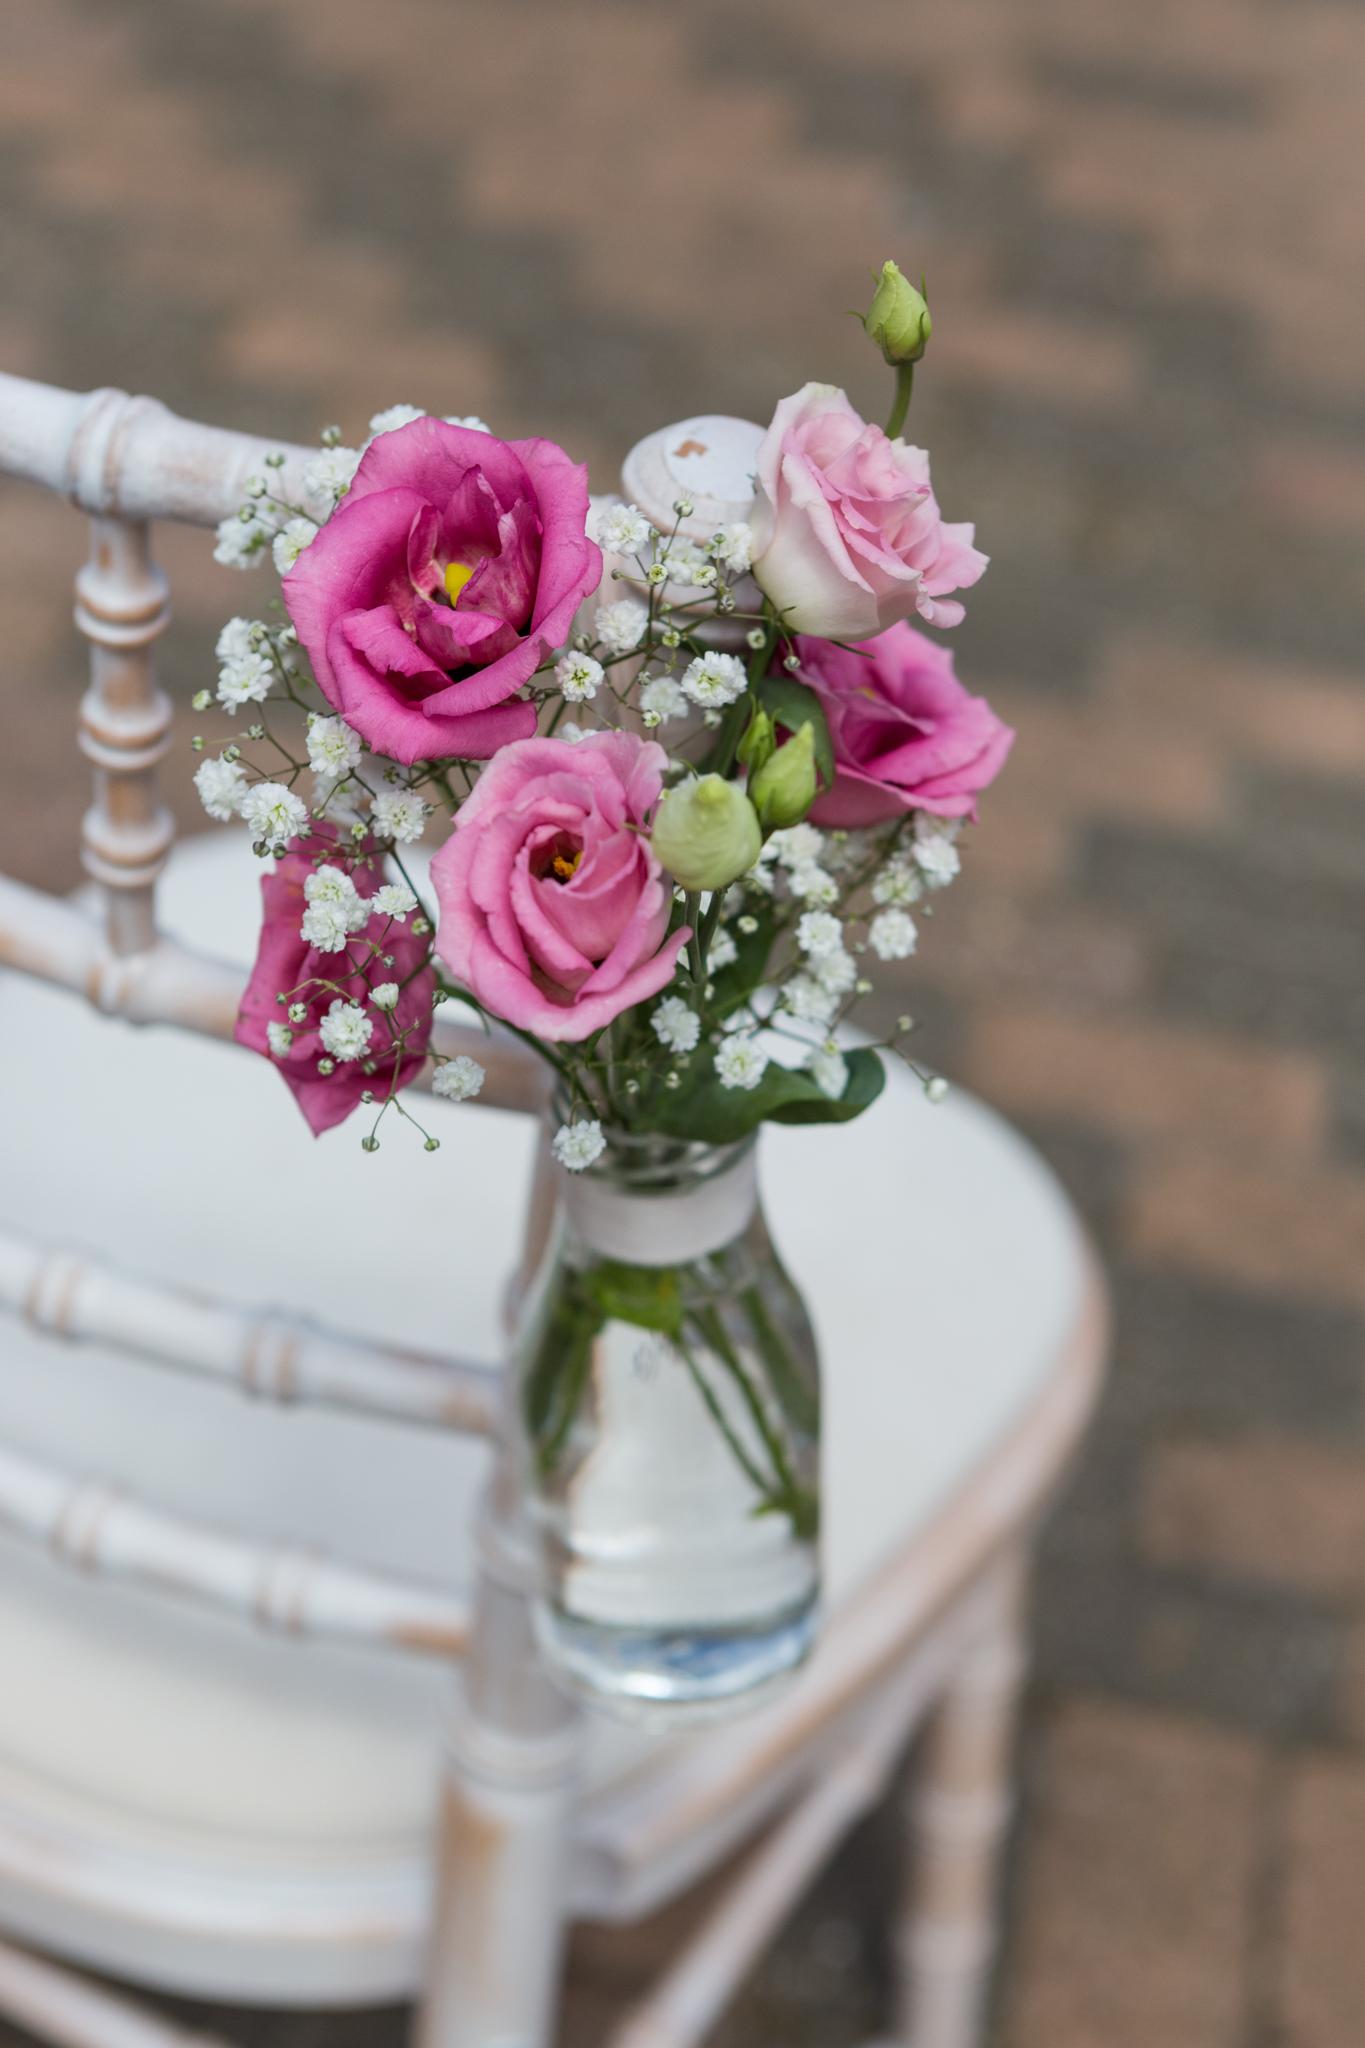 Chair_flower_ideas_Old_Greens_Barn_Newdigate_Surrey_Wedding_Photographer_Rachel_Thornhill_Photograph